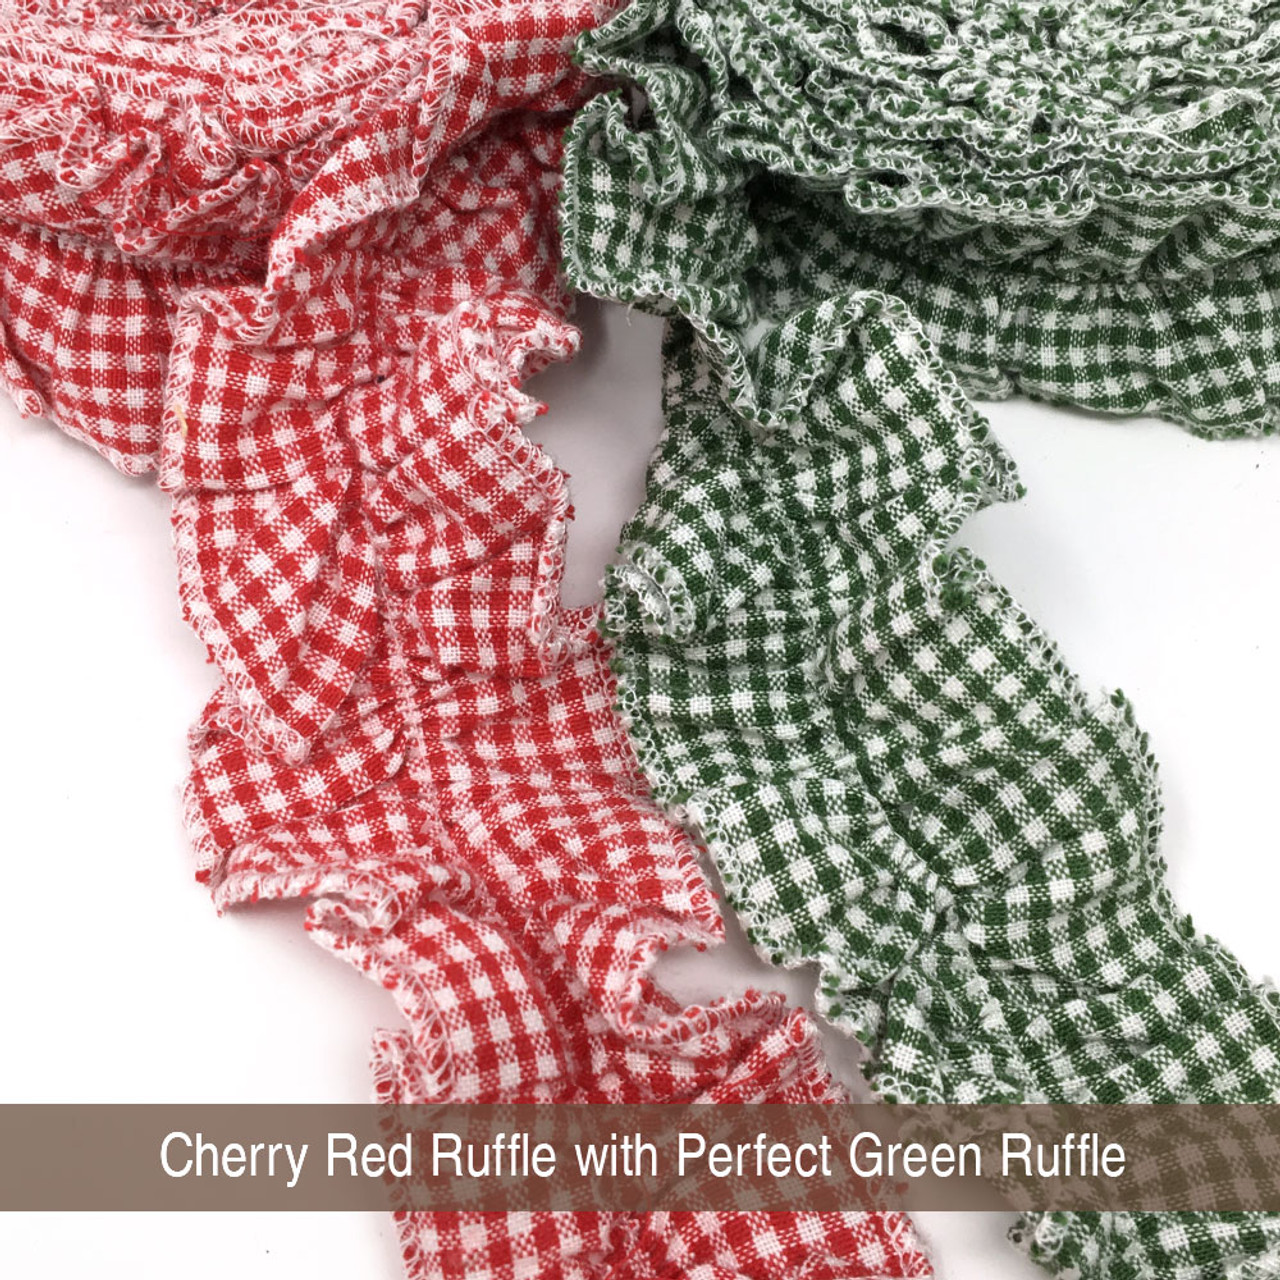 Perfect Green 2 Ruffled Trim/Garland  - 1 roll - 144 inches (12 feet)